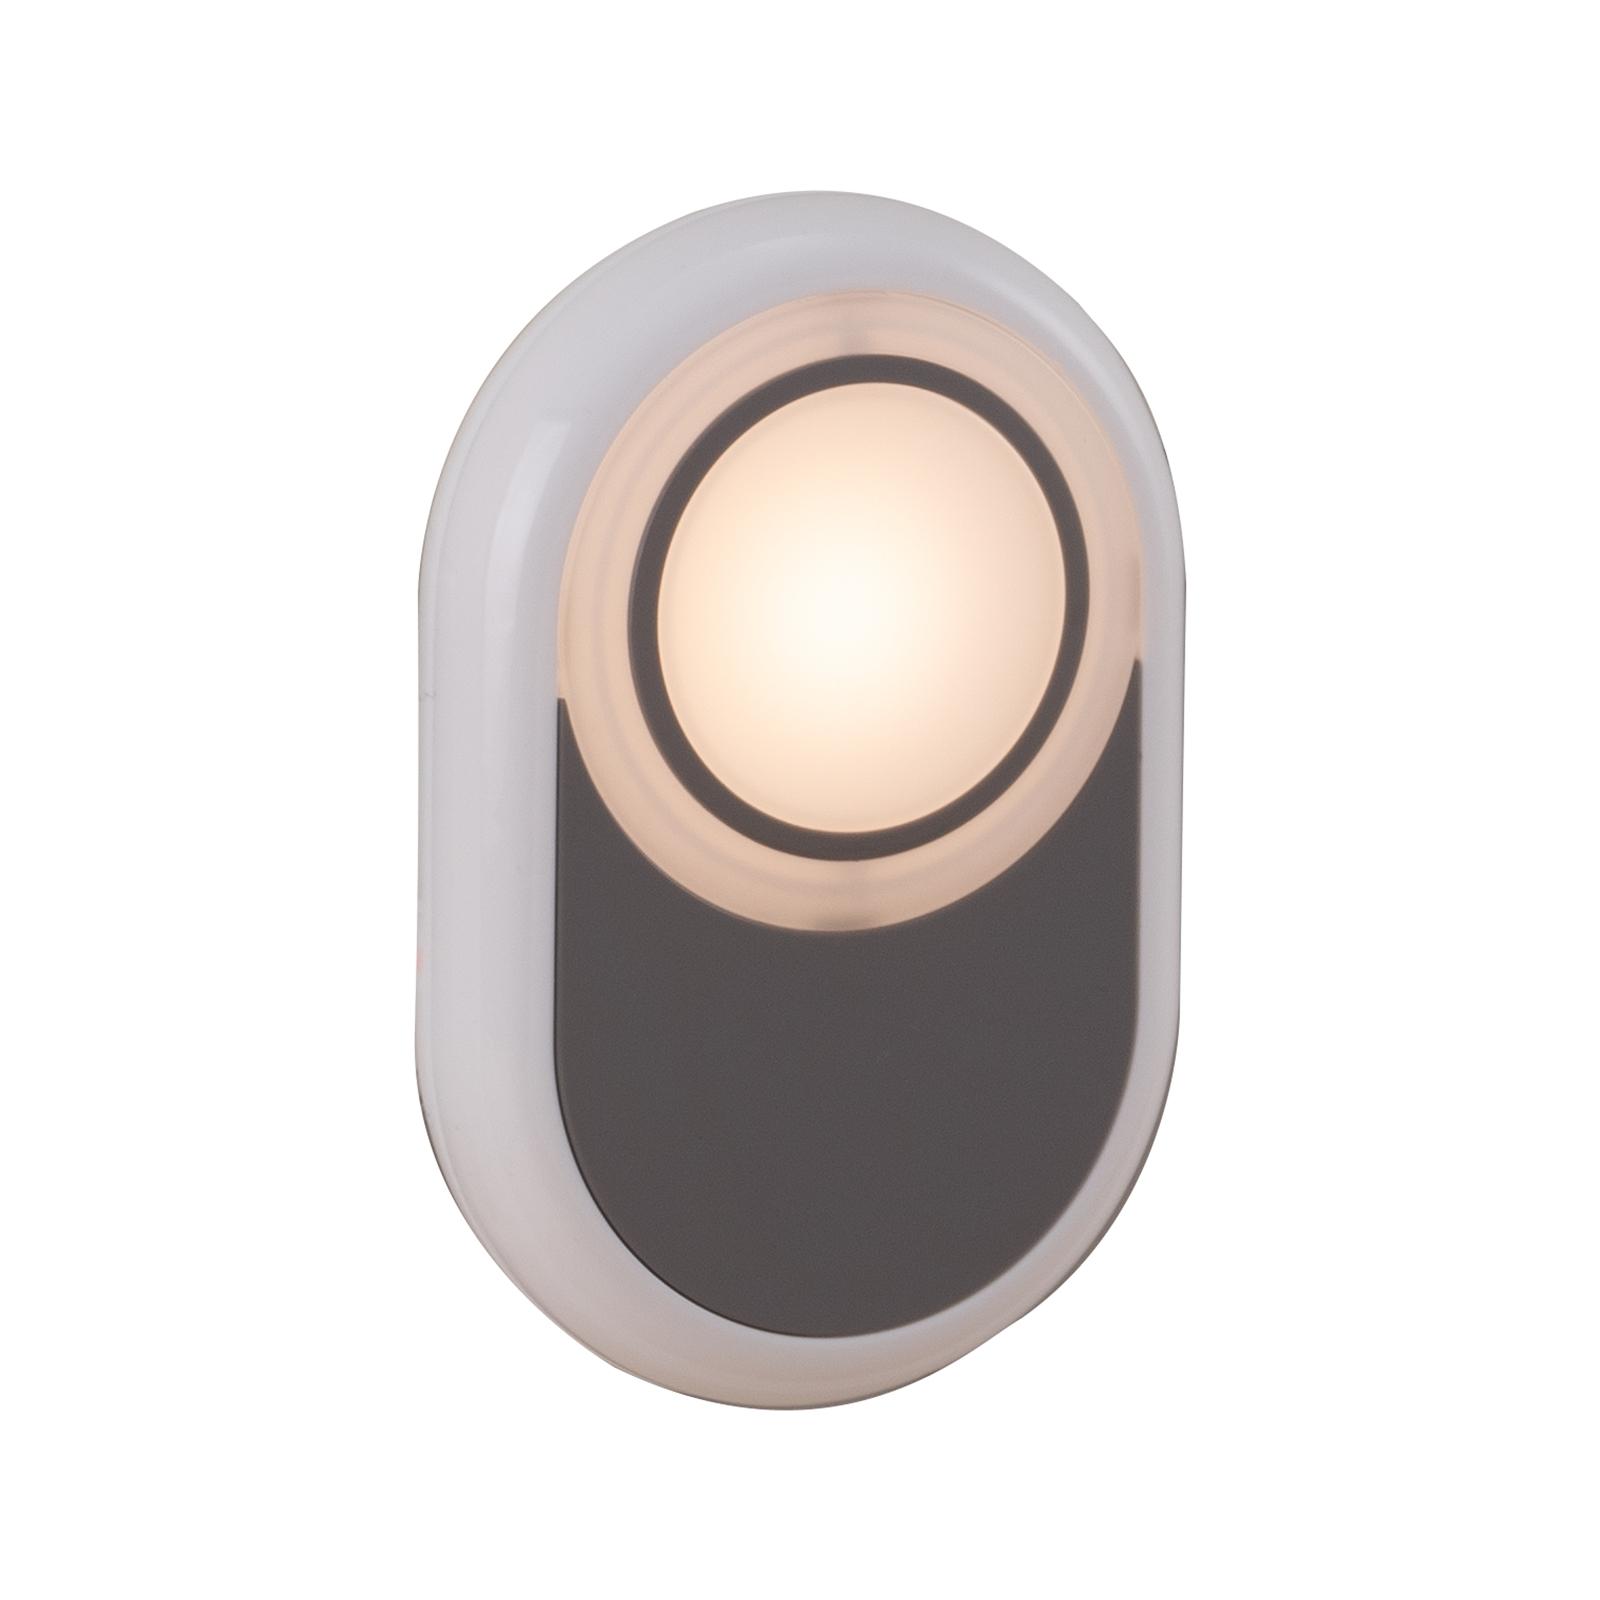 Arlec Pill Plug-In LED Night Light